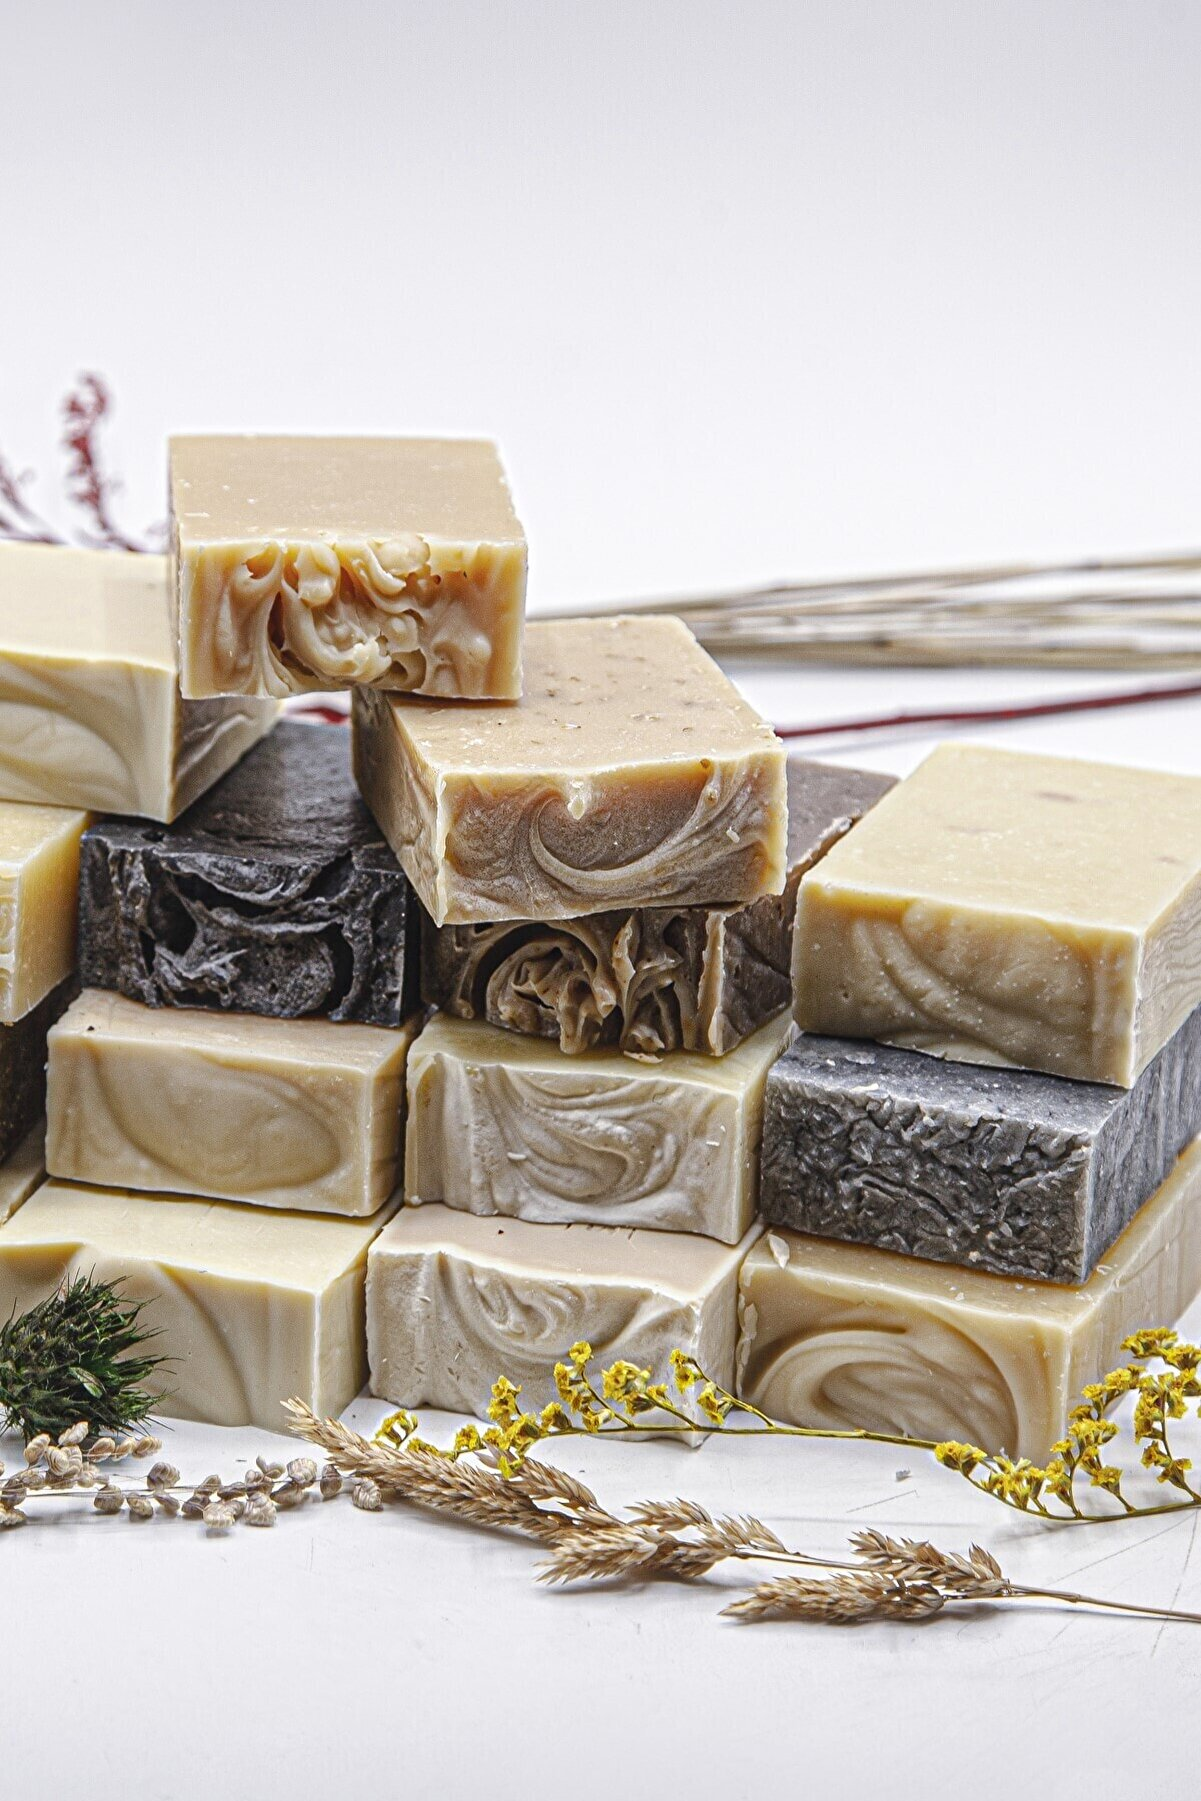 crs sope & soap Skin Care Natural Soap